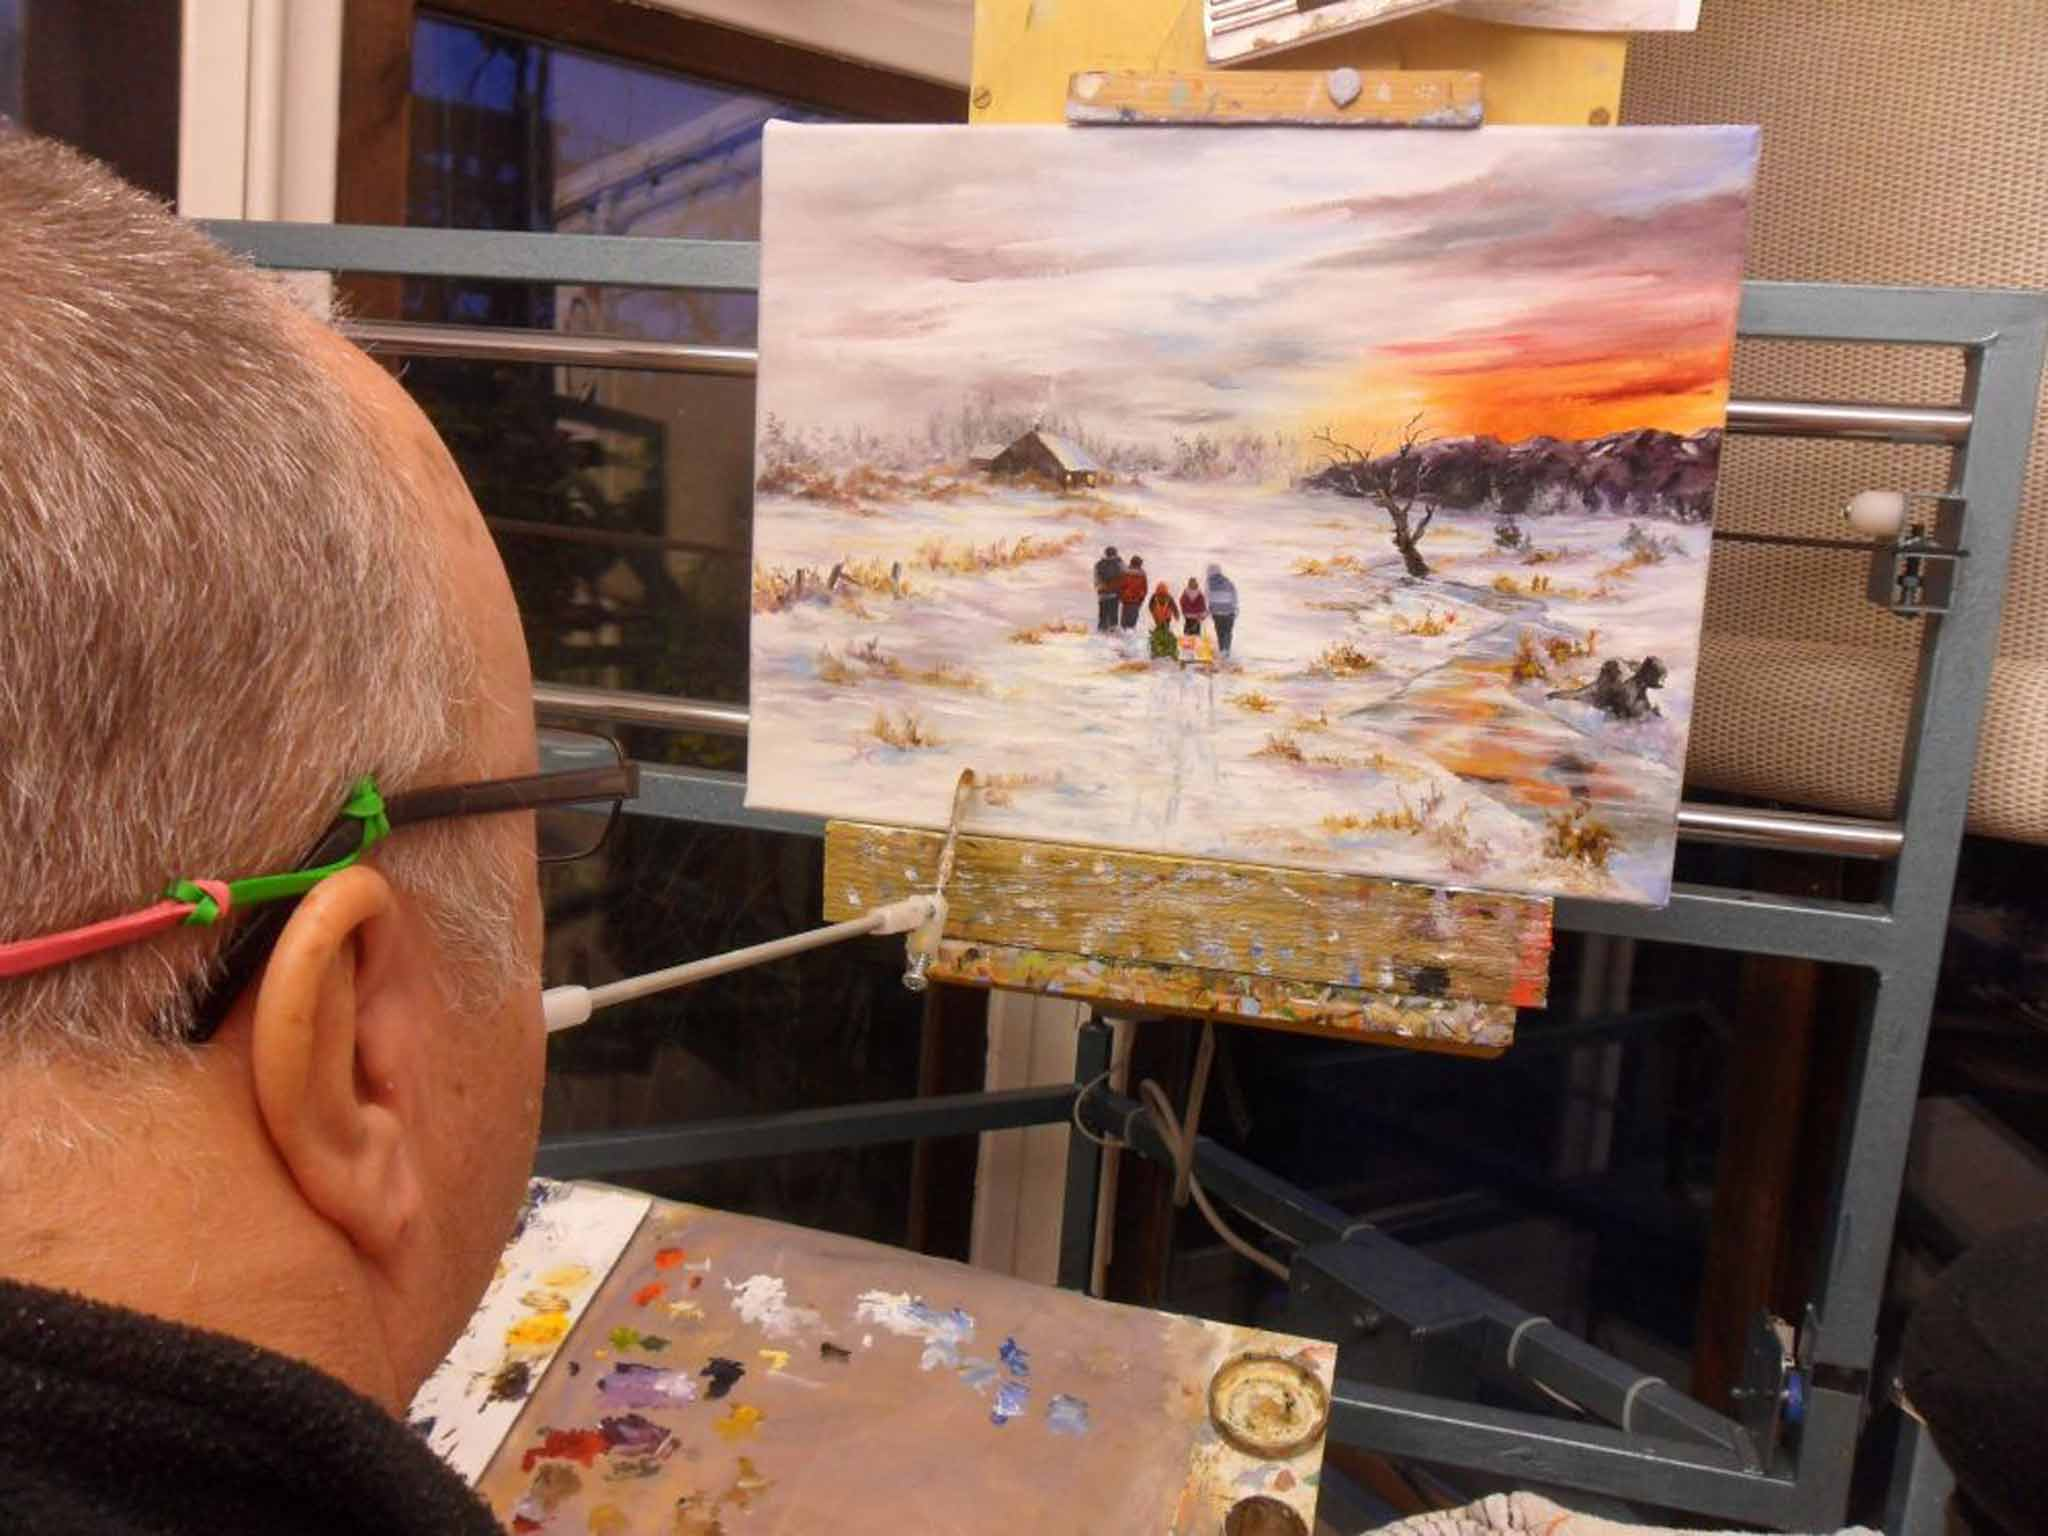 Peter Draws How To Make Expensive Art